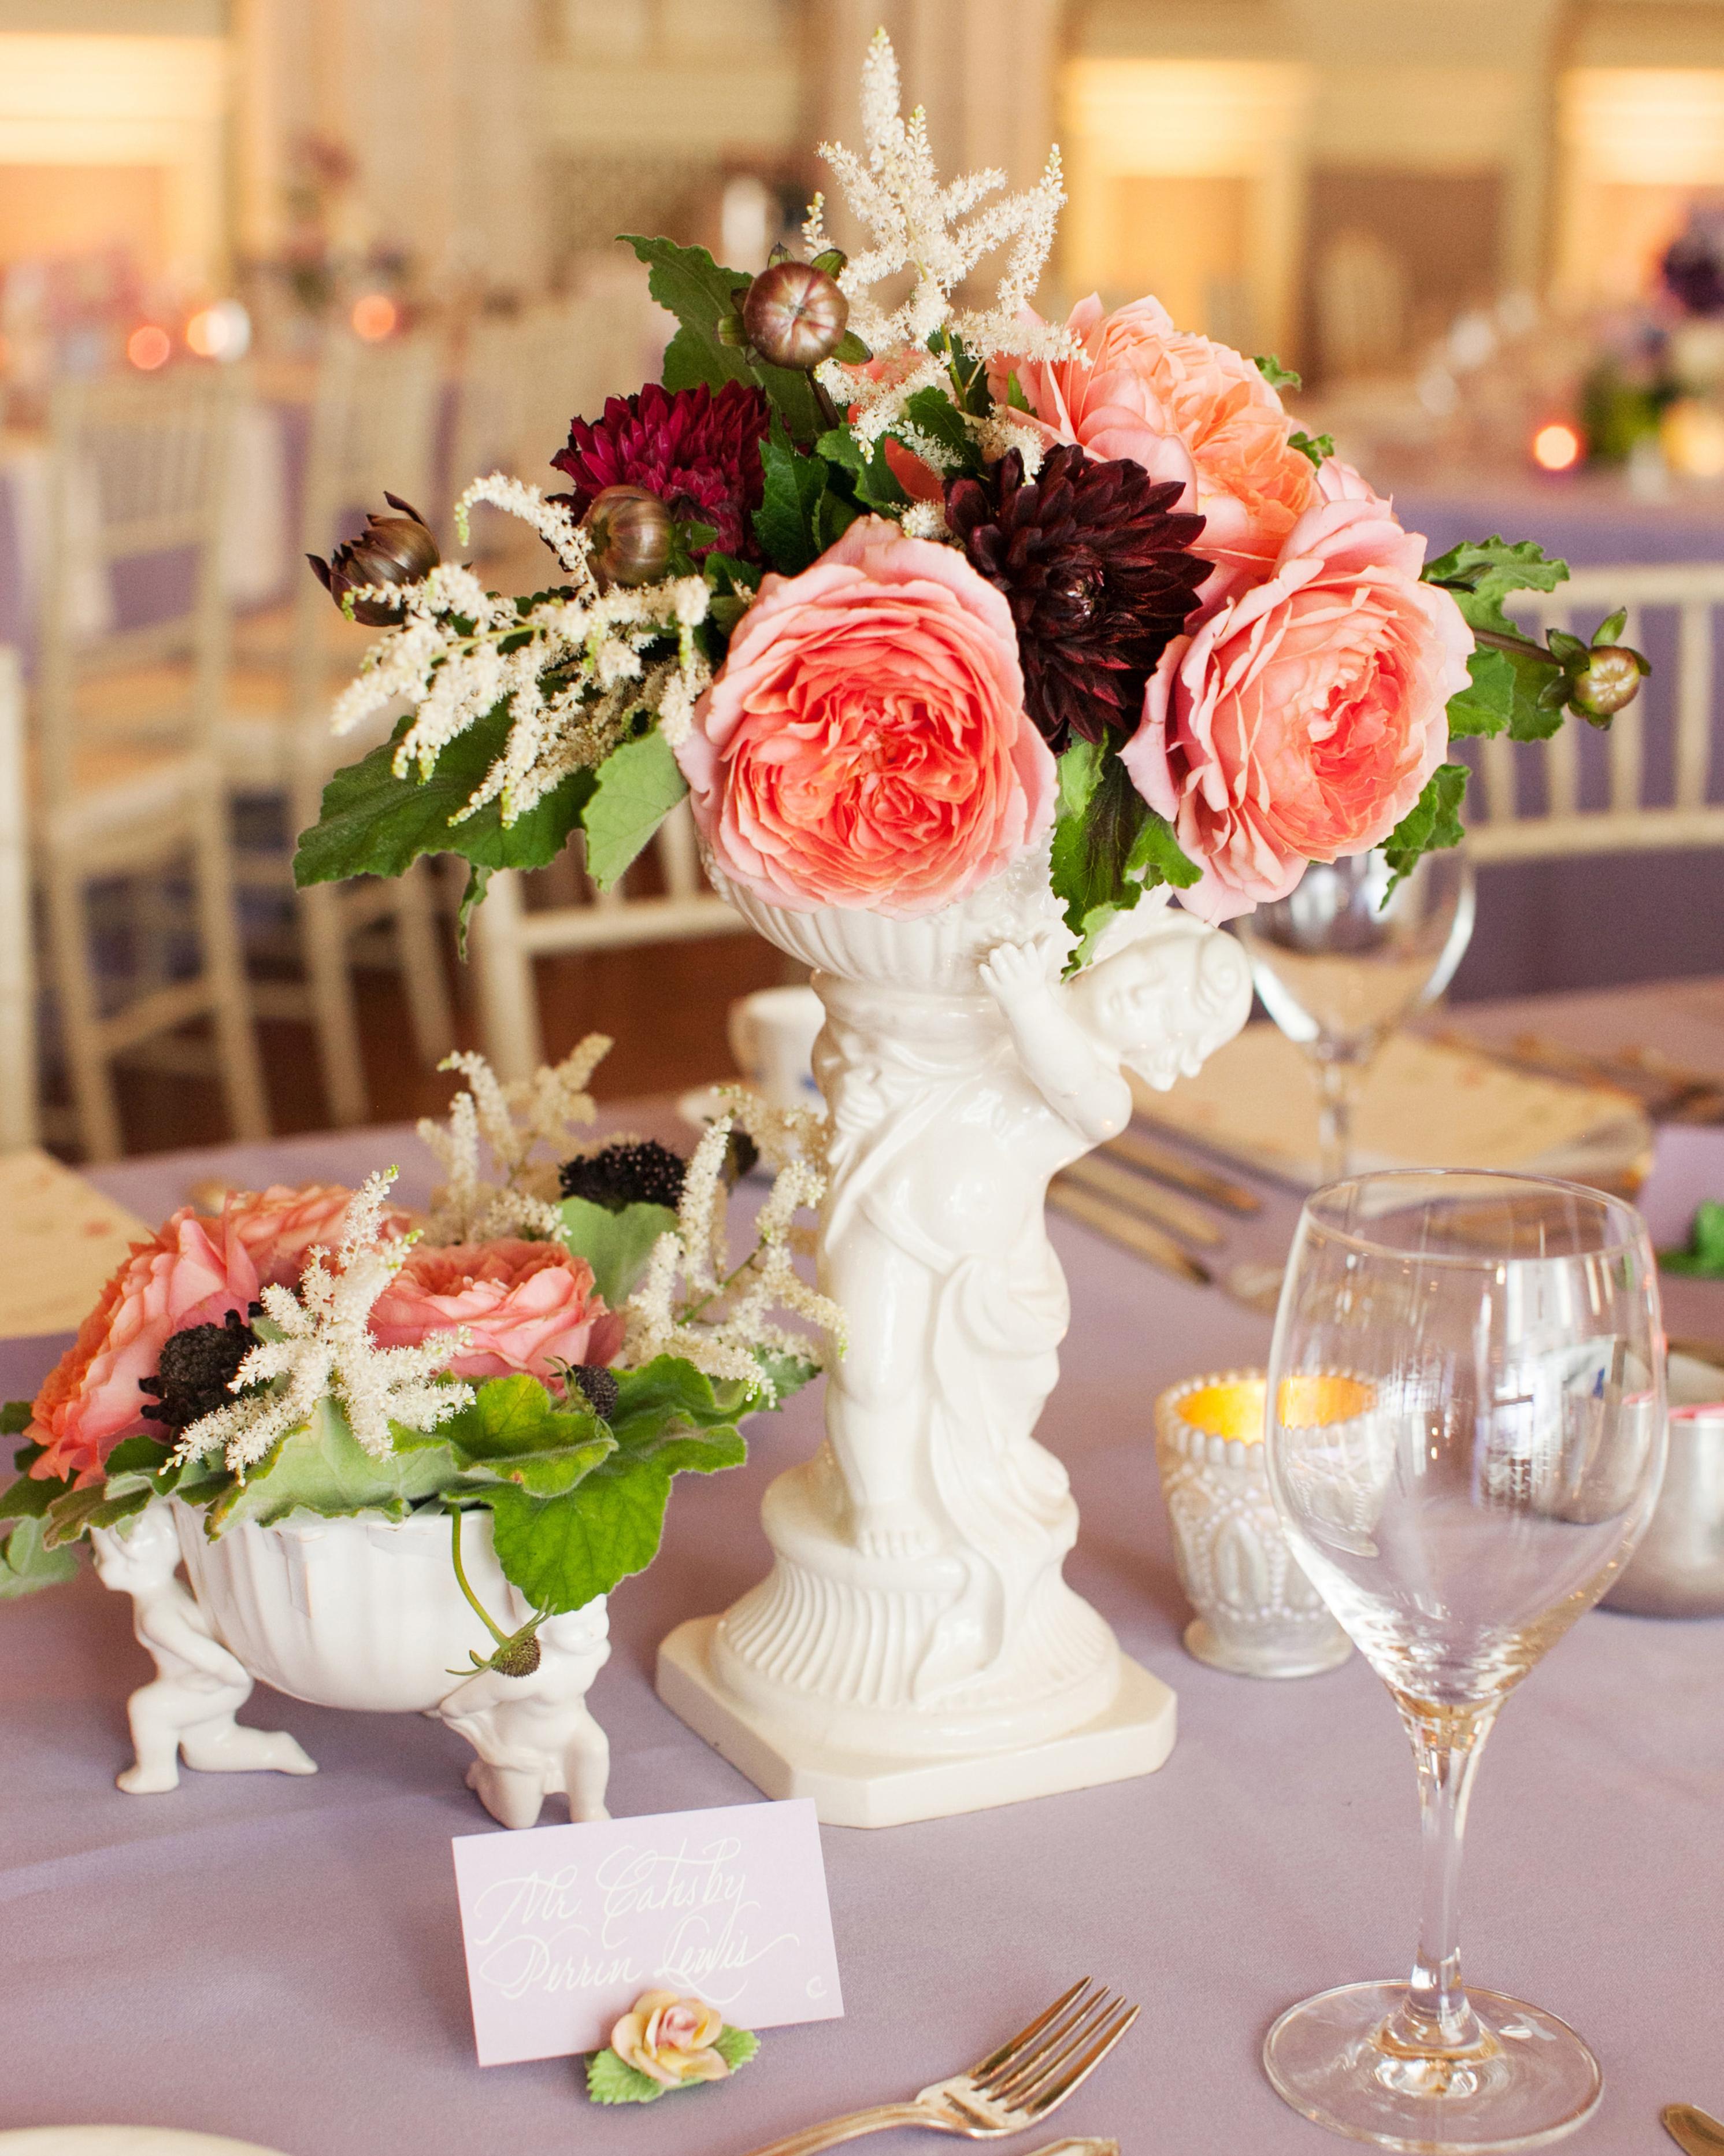 katelyn-austin-wedding-virgina-ka0791-s111979-0615.jpg